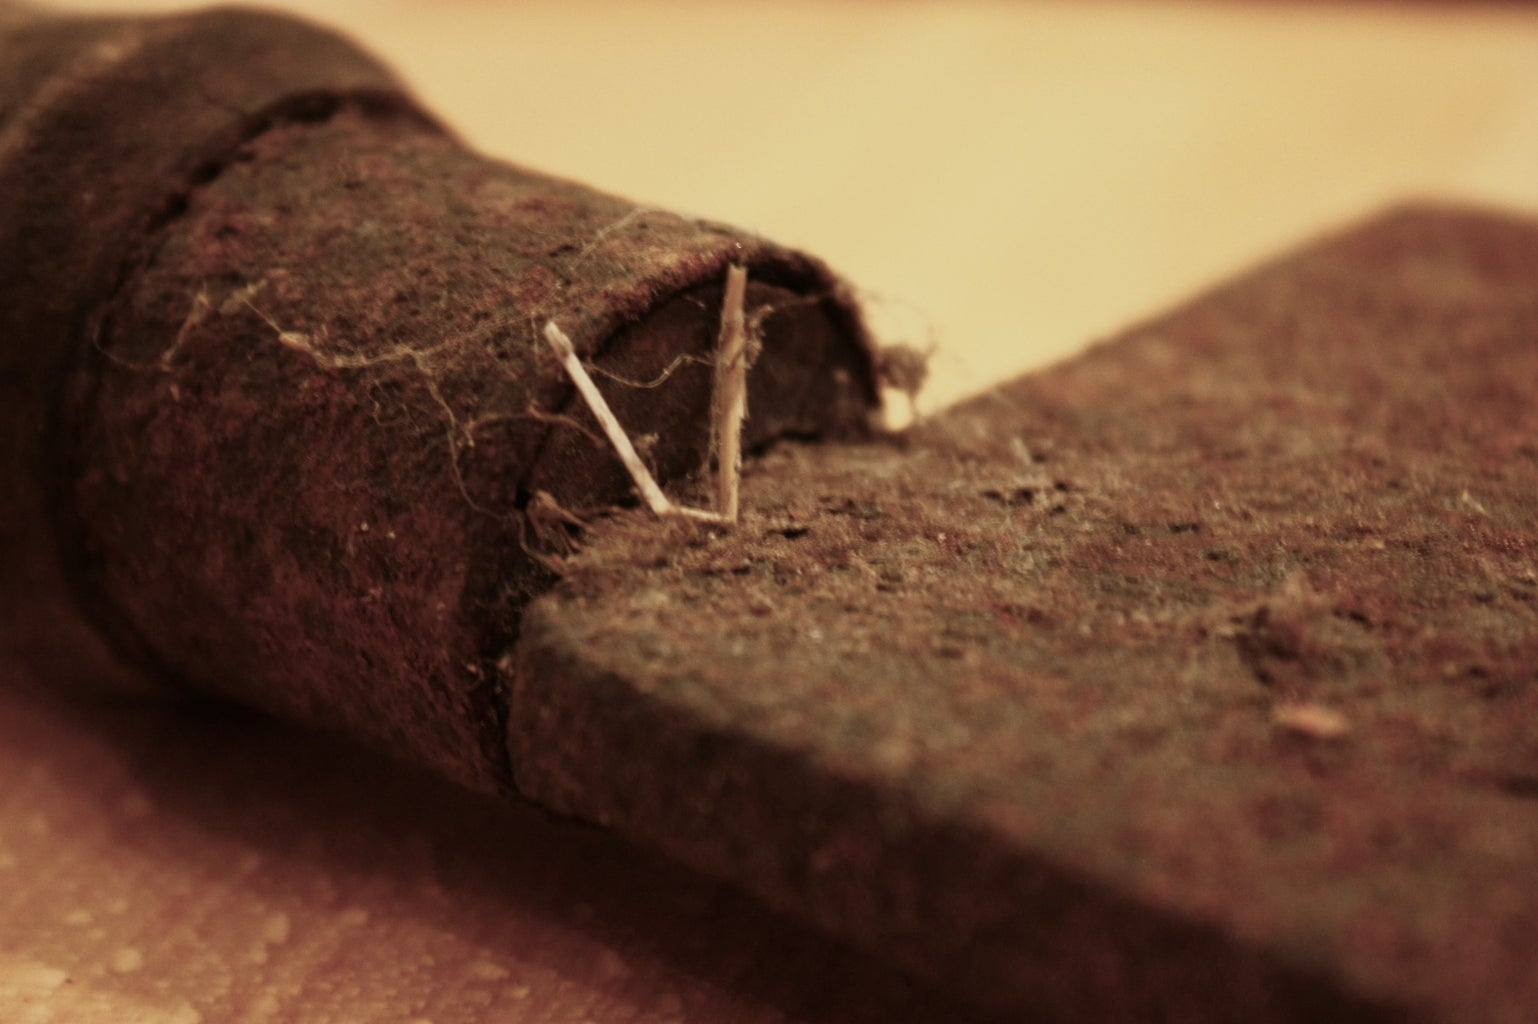 Old Knife Restoration (Step by Step)